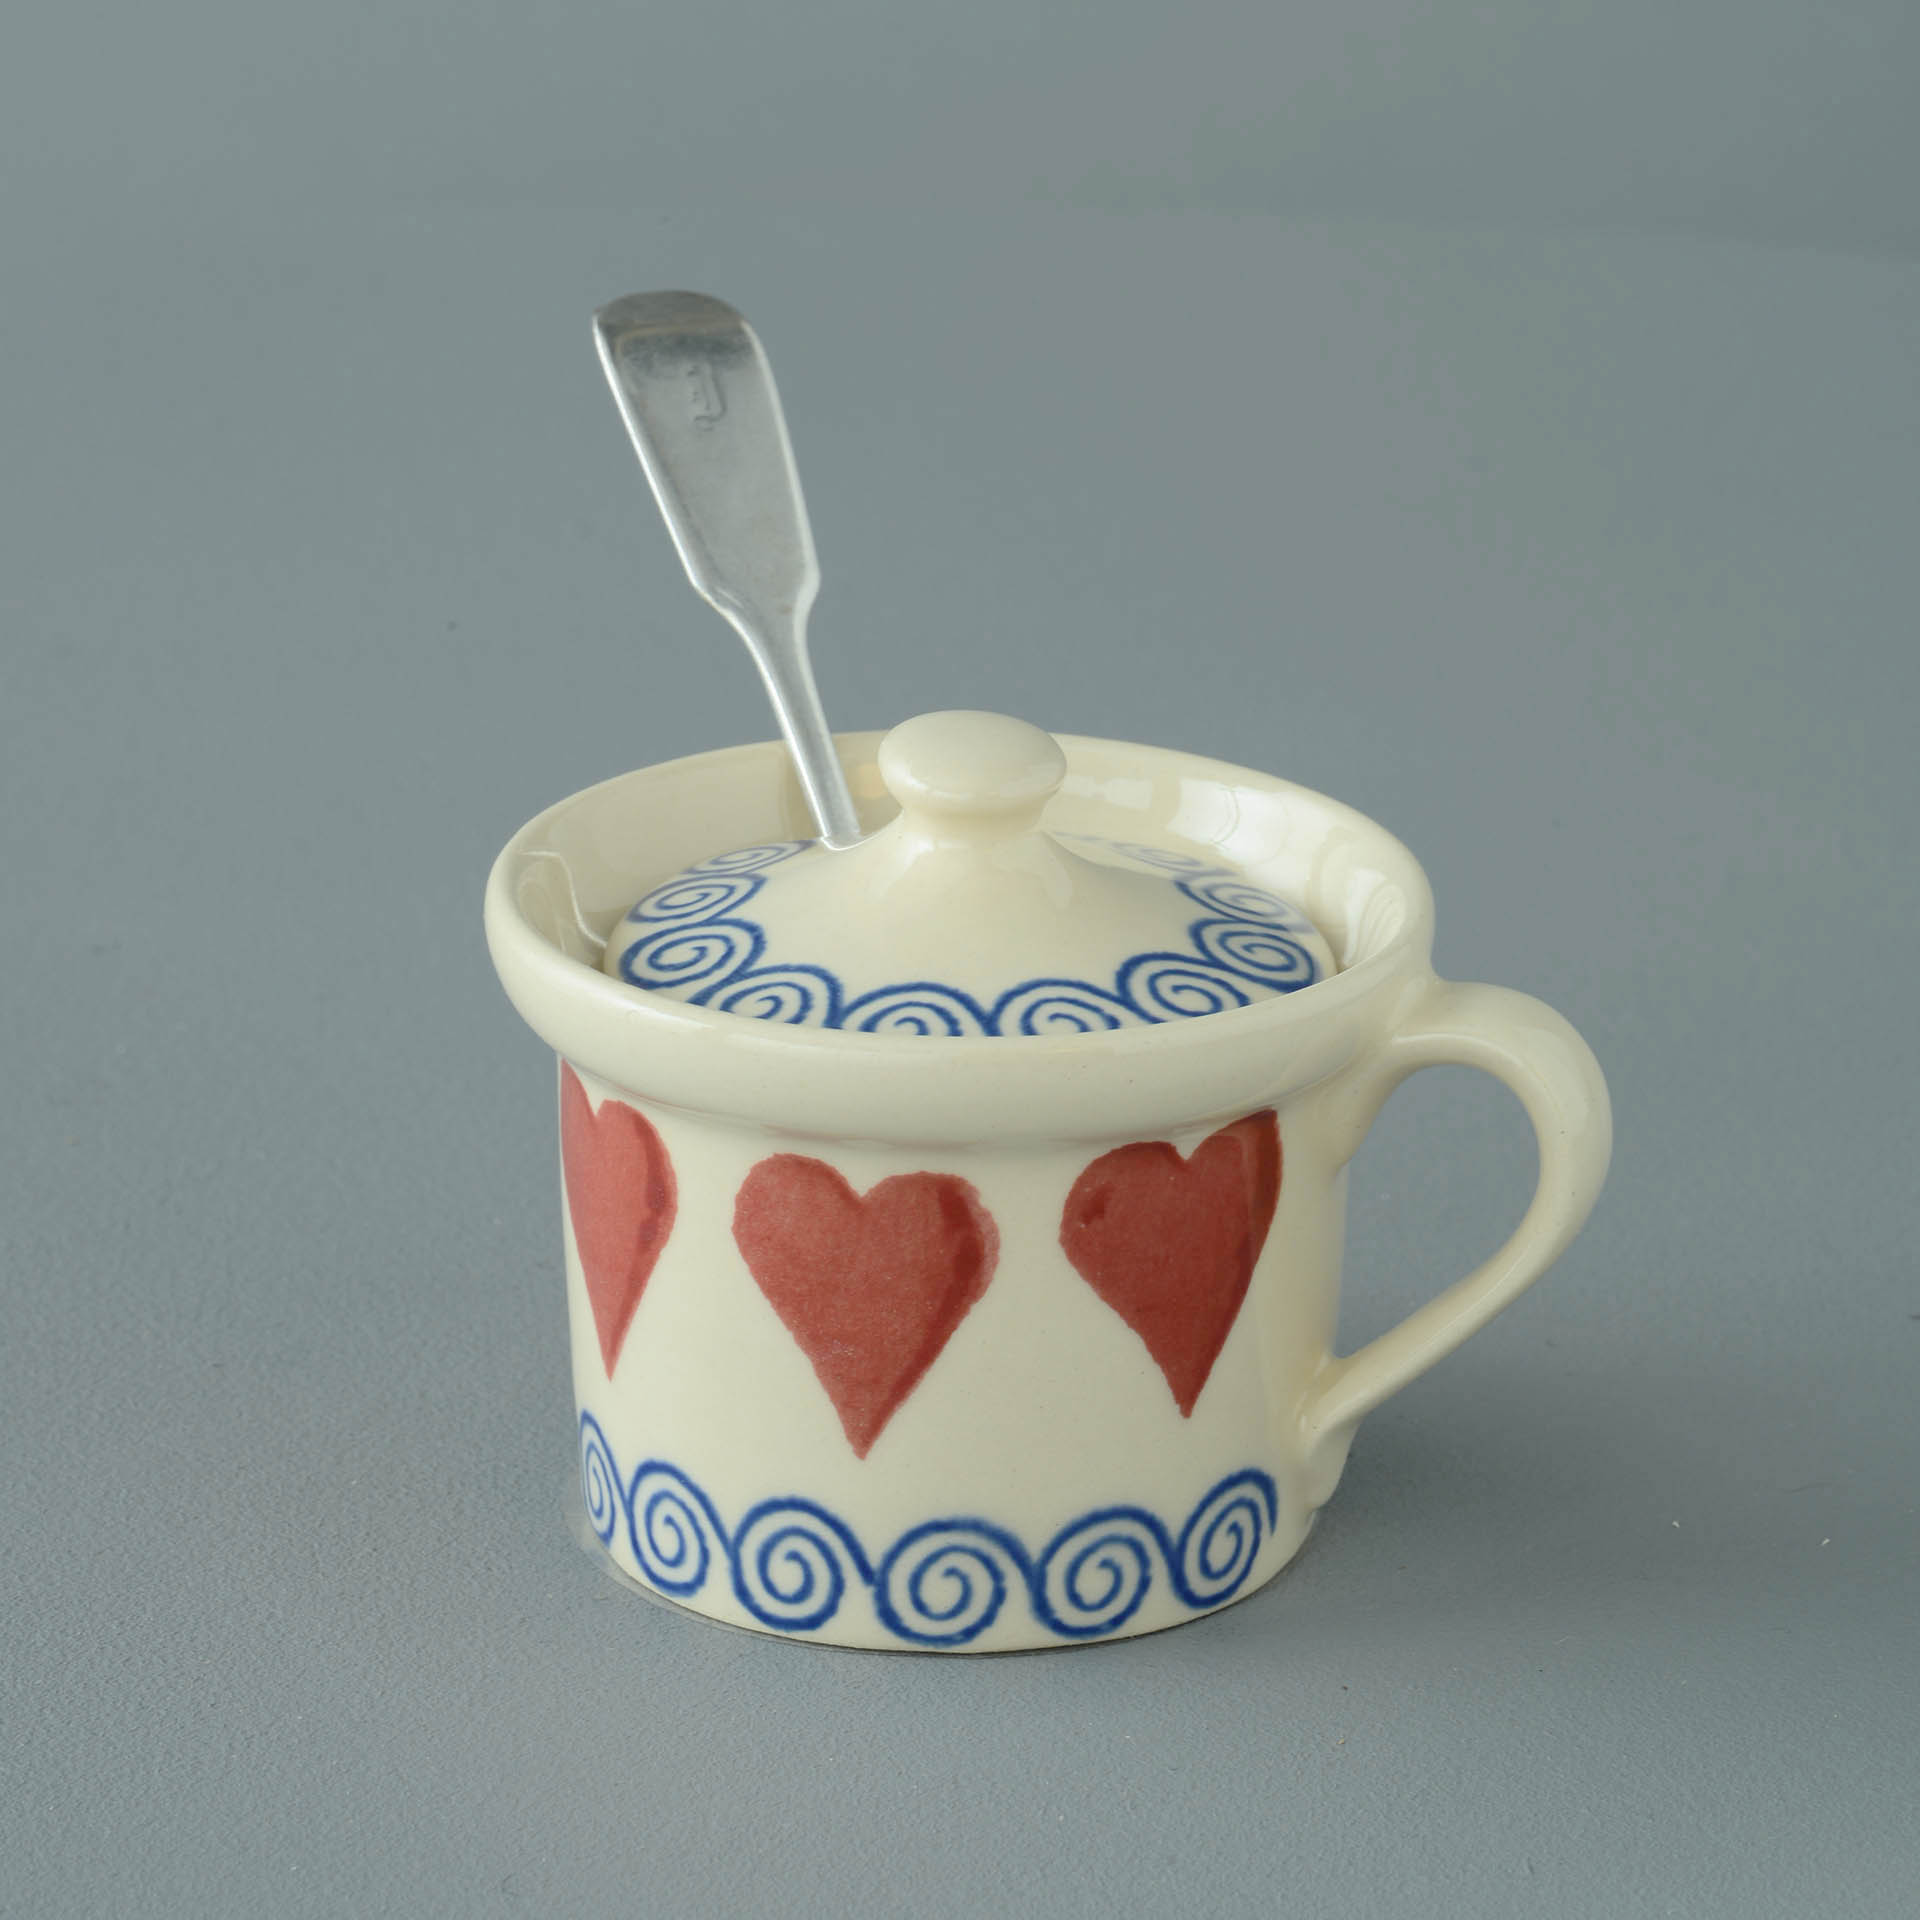 Hearts Mustard Pot 7.8(w) x 5.4(h) cm